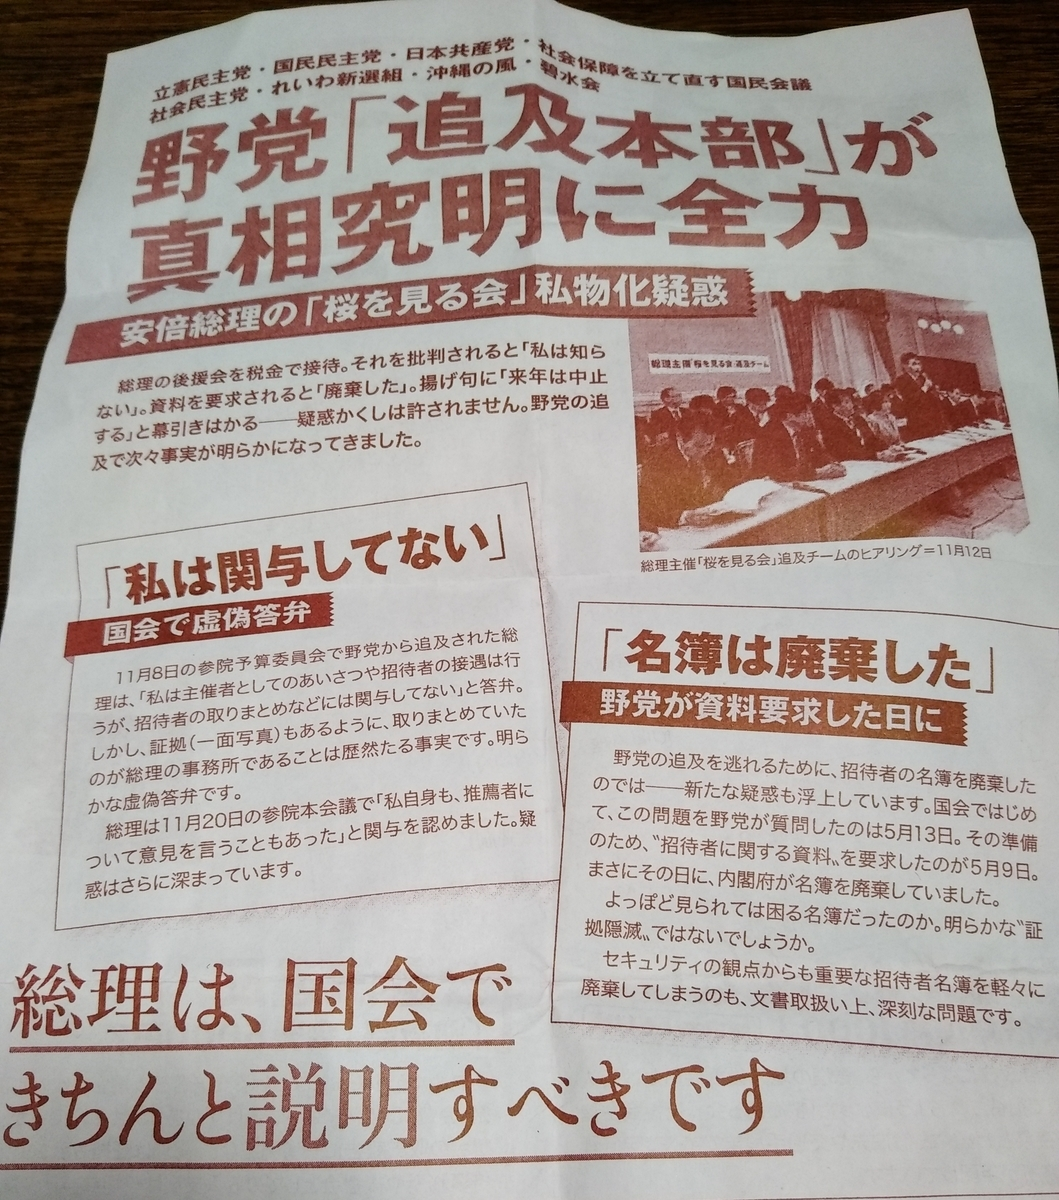 f:id:kaon-yokegawa:20200101135640j:plain